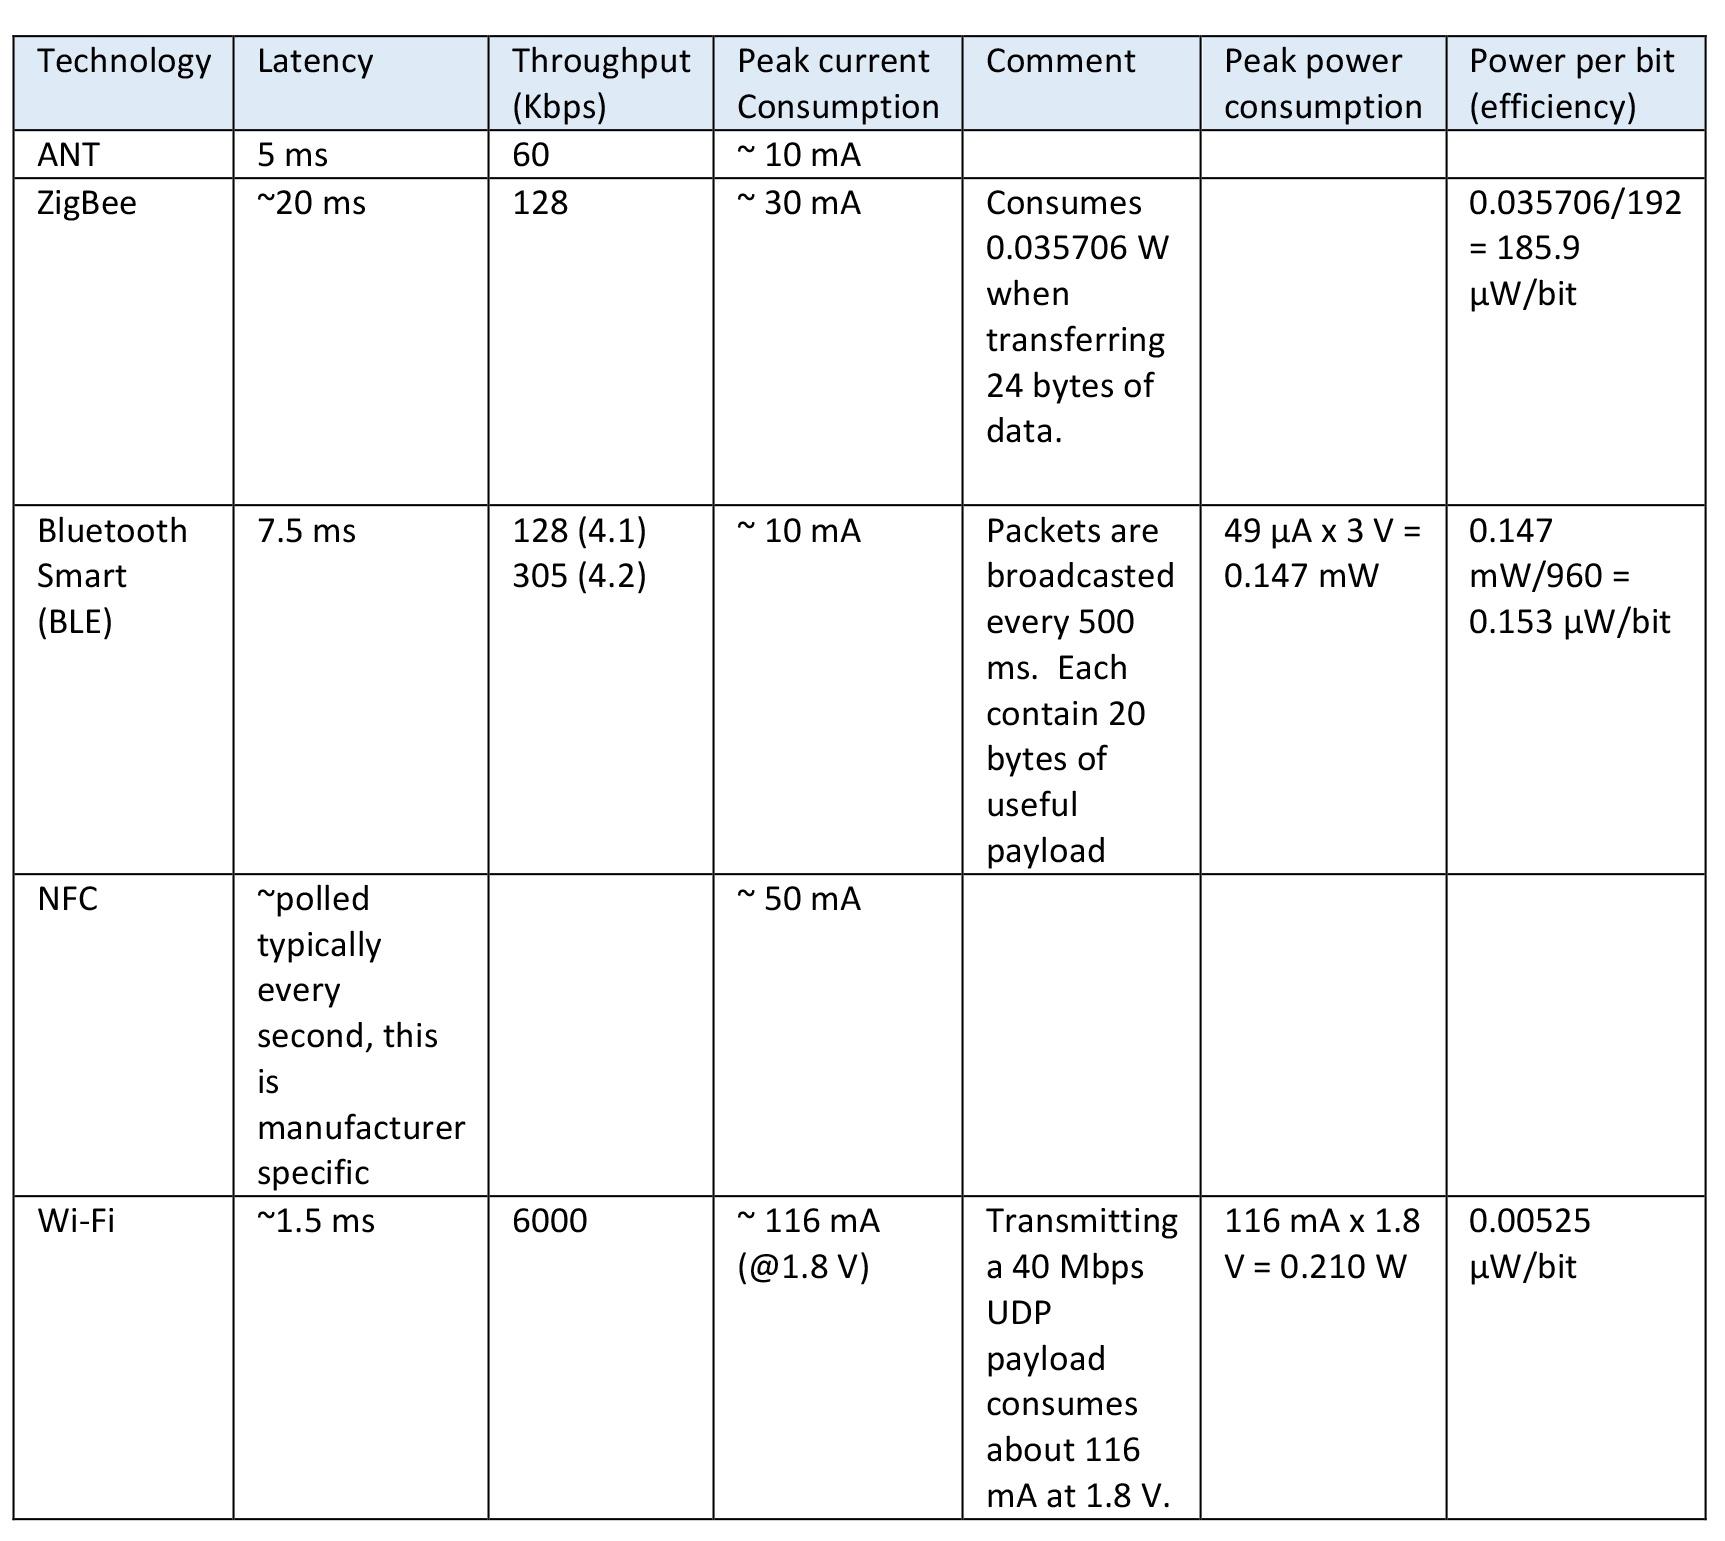 table_power_1.jpg